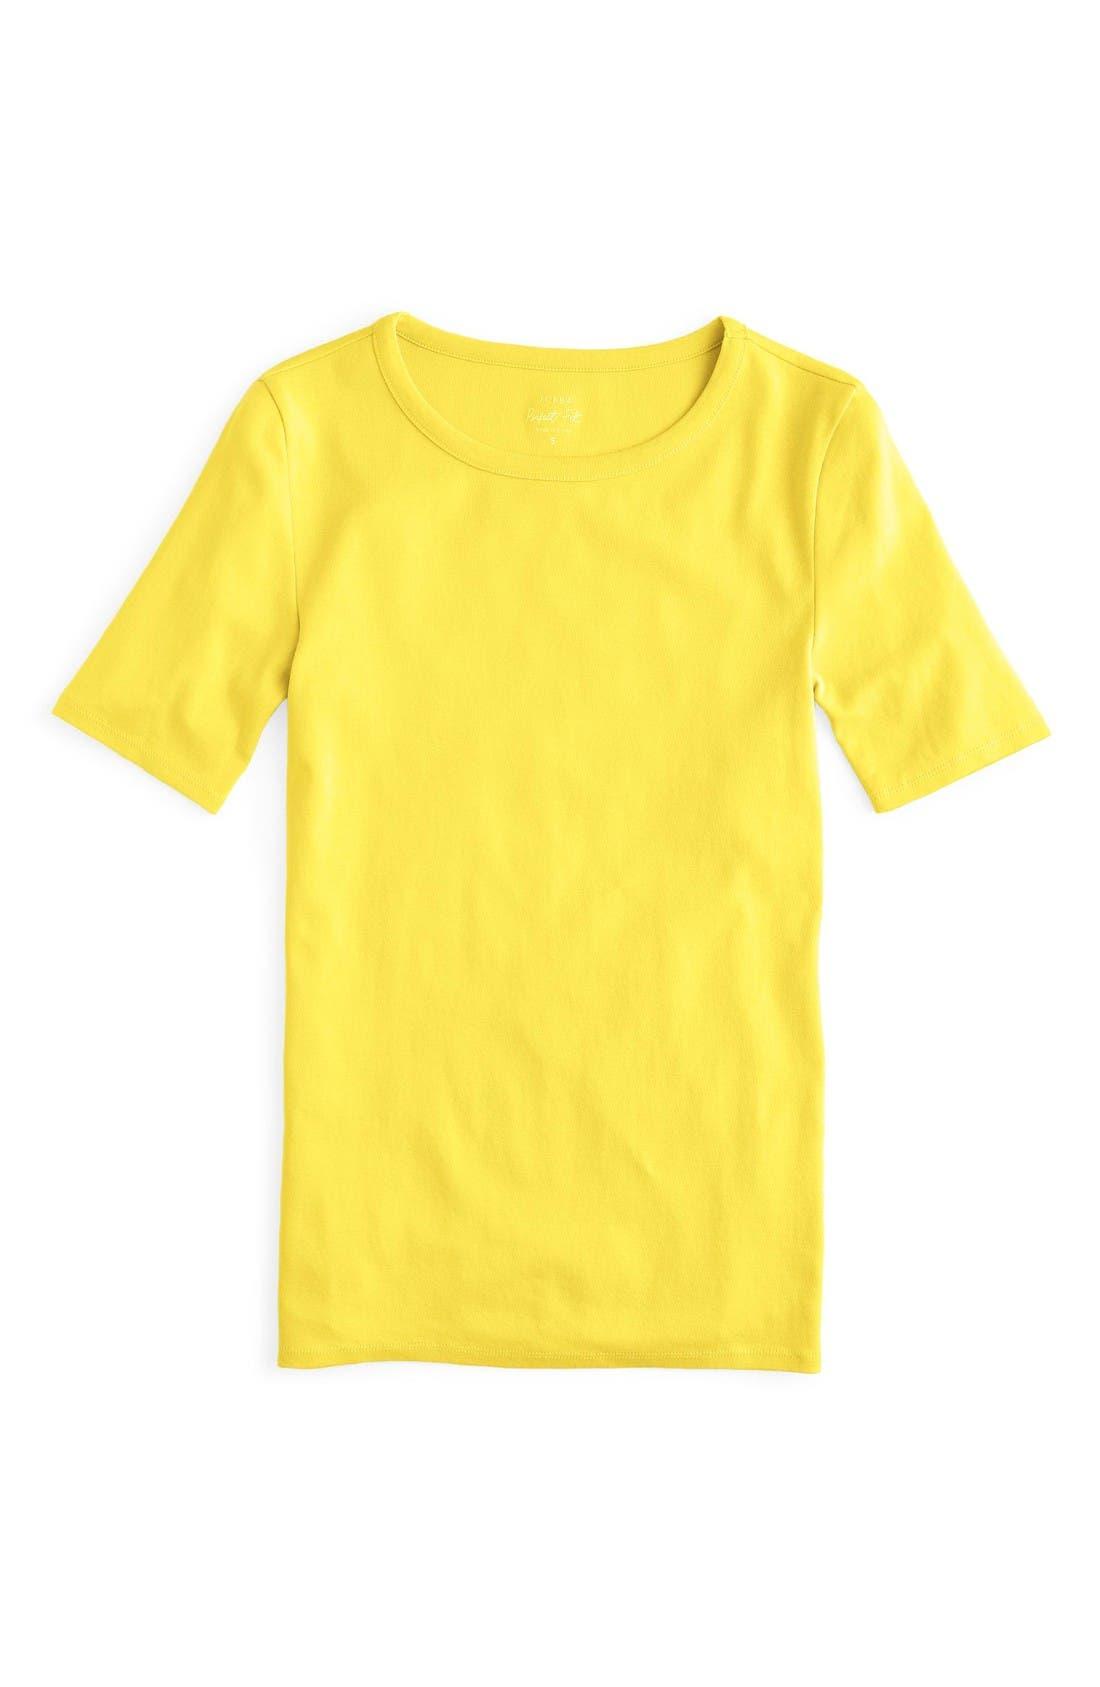 J.Crew New Perfect Fit T-Shirt,                             Main thumbnail 1, color,                             Bright Citrus